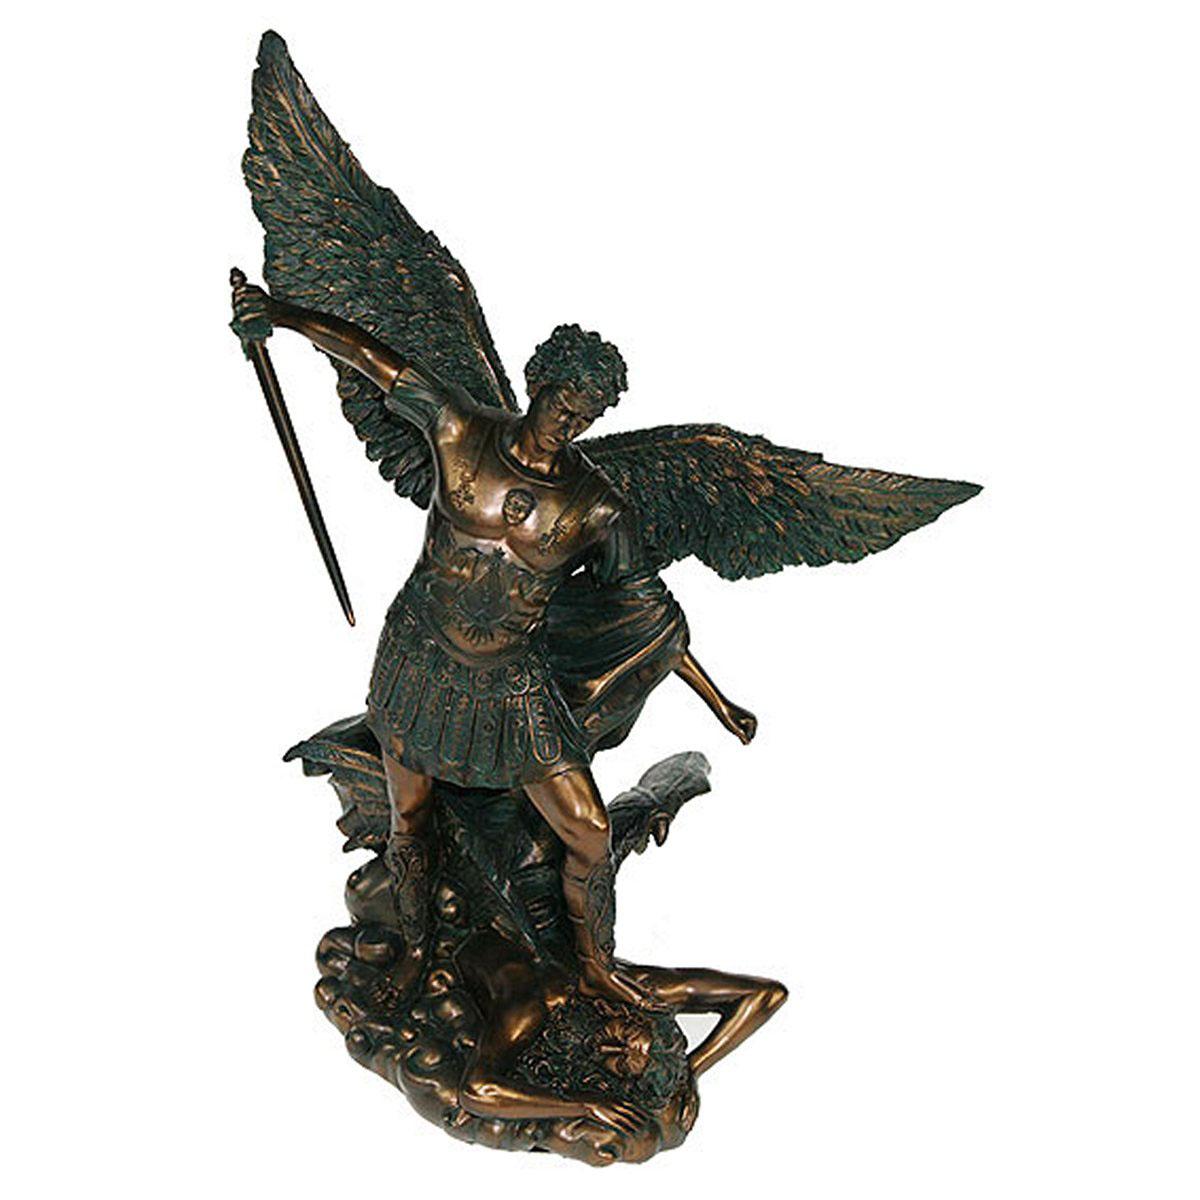 Статуэтка Русские Подарки Архангел Михаил, 24 х 29 см статуэтка русские подарки африканка 11 х 15 х 24 см